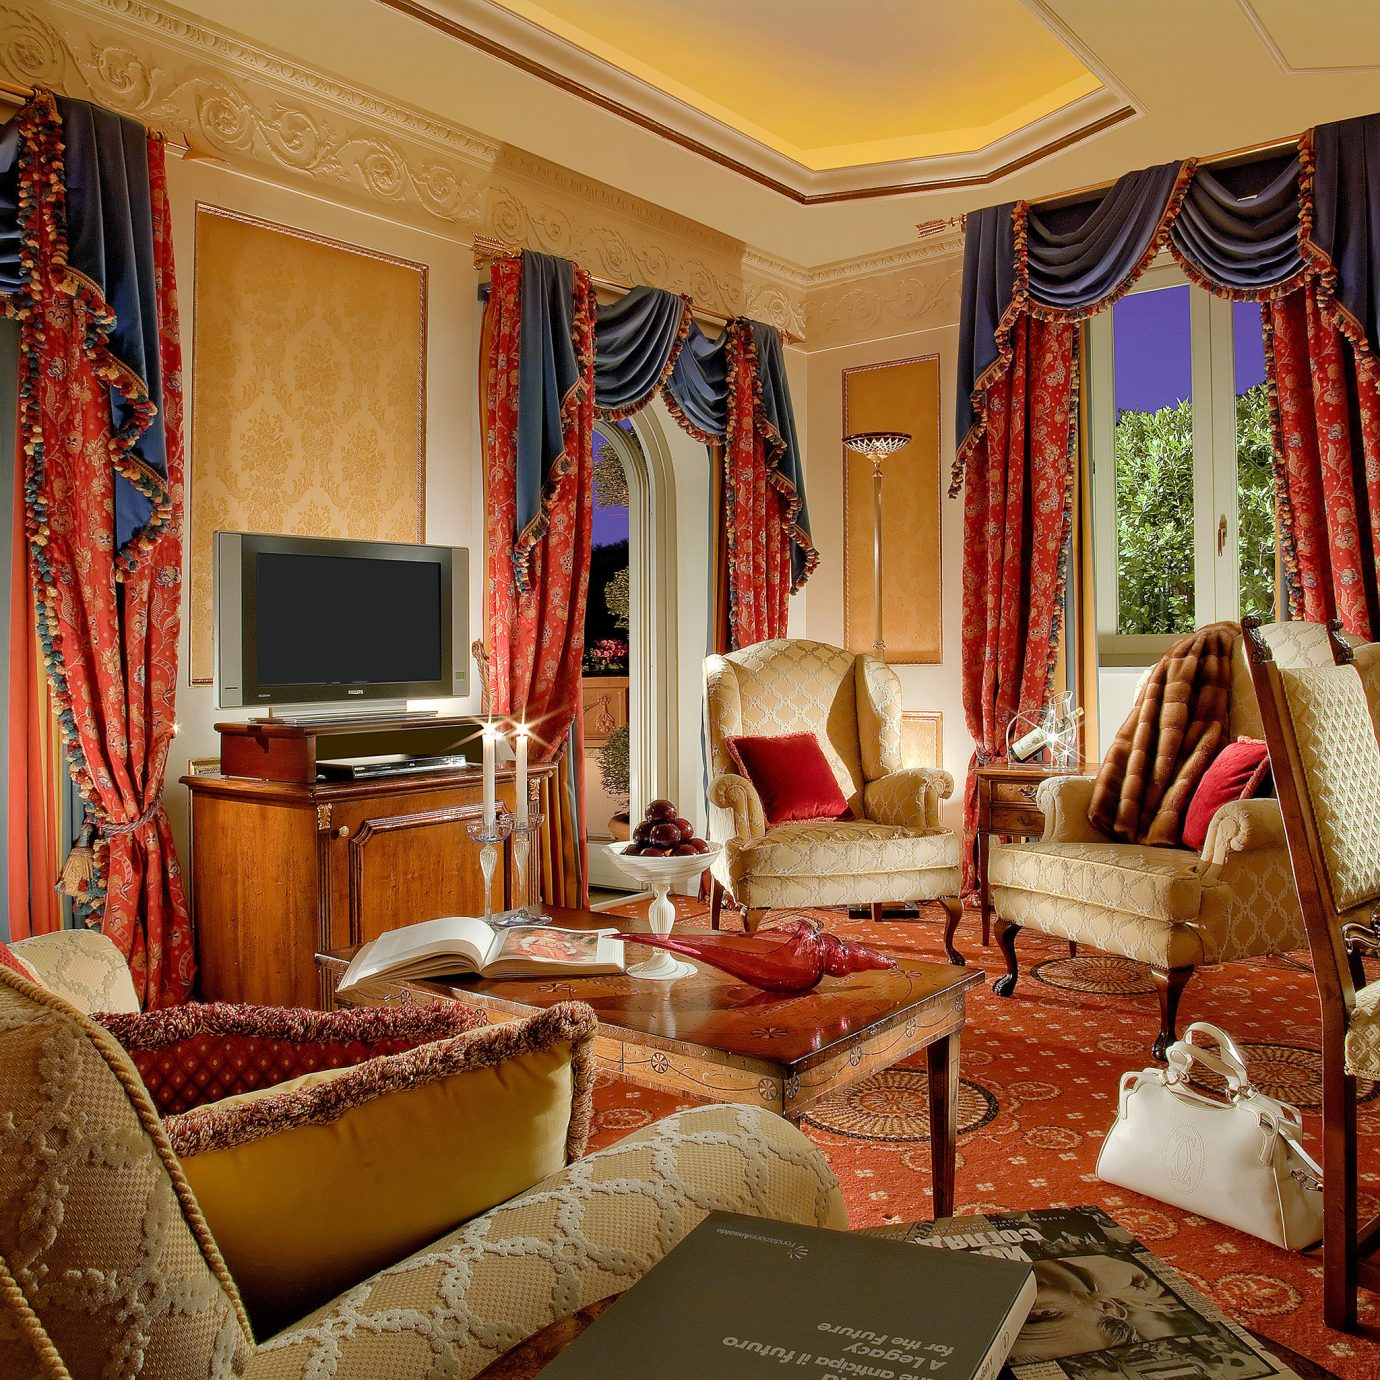 City Classic Elegant Historic Honeymoon Romance Romantic Suite sofa property living room home mansion Resort Villa cottage